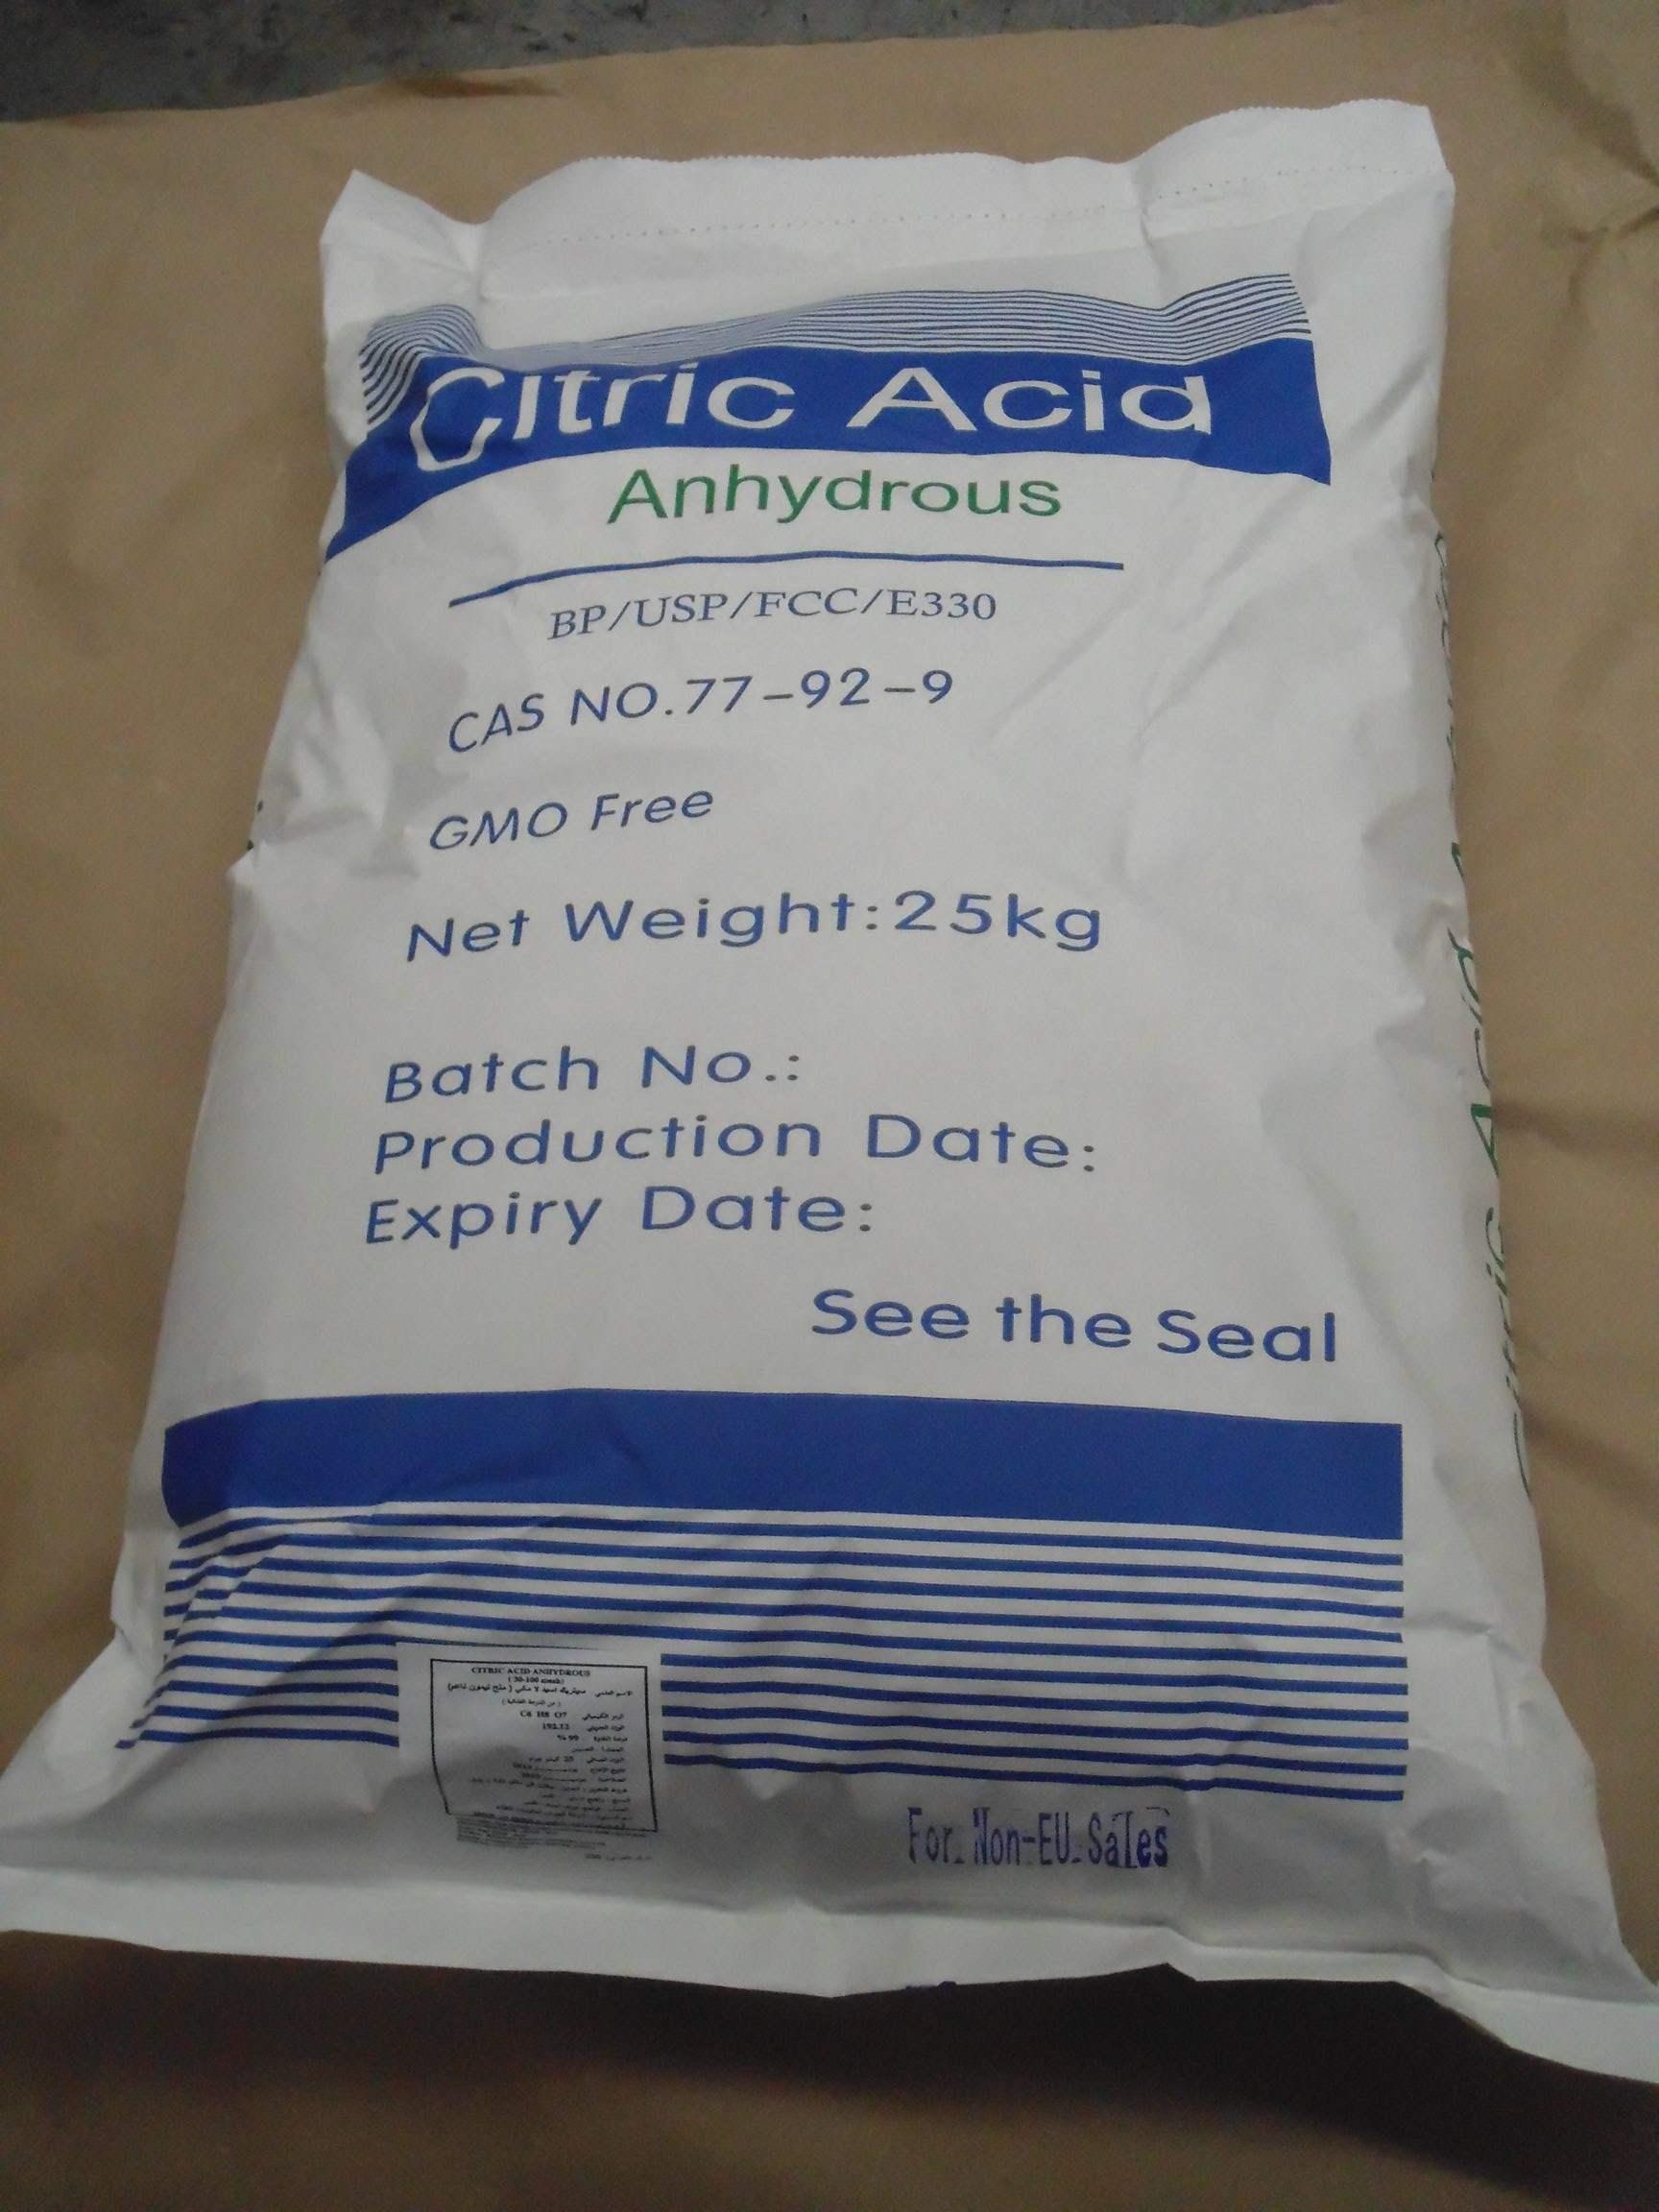 Citric Acid Monohydrate CAS: 5949-29-1 Citric Acid Anhydrous CAS: 77-92-9